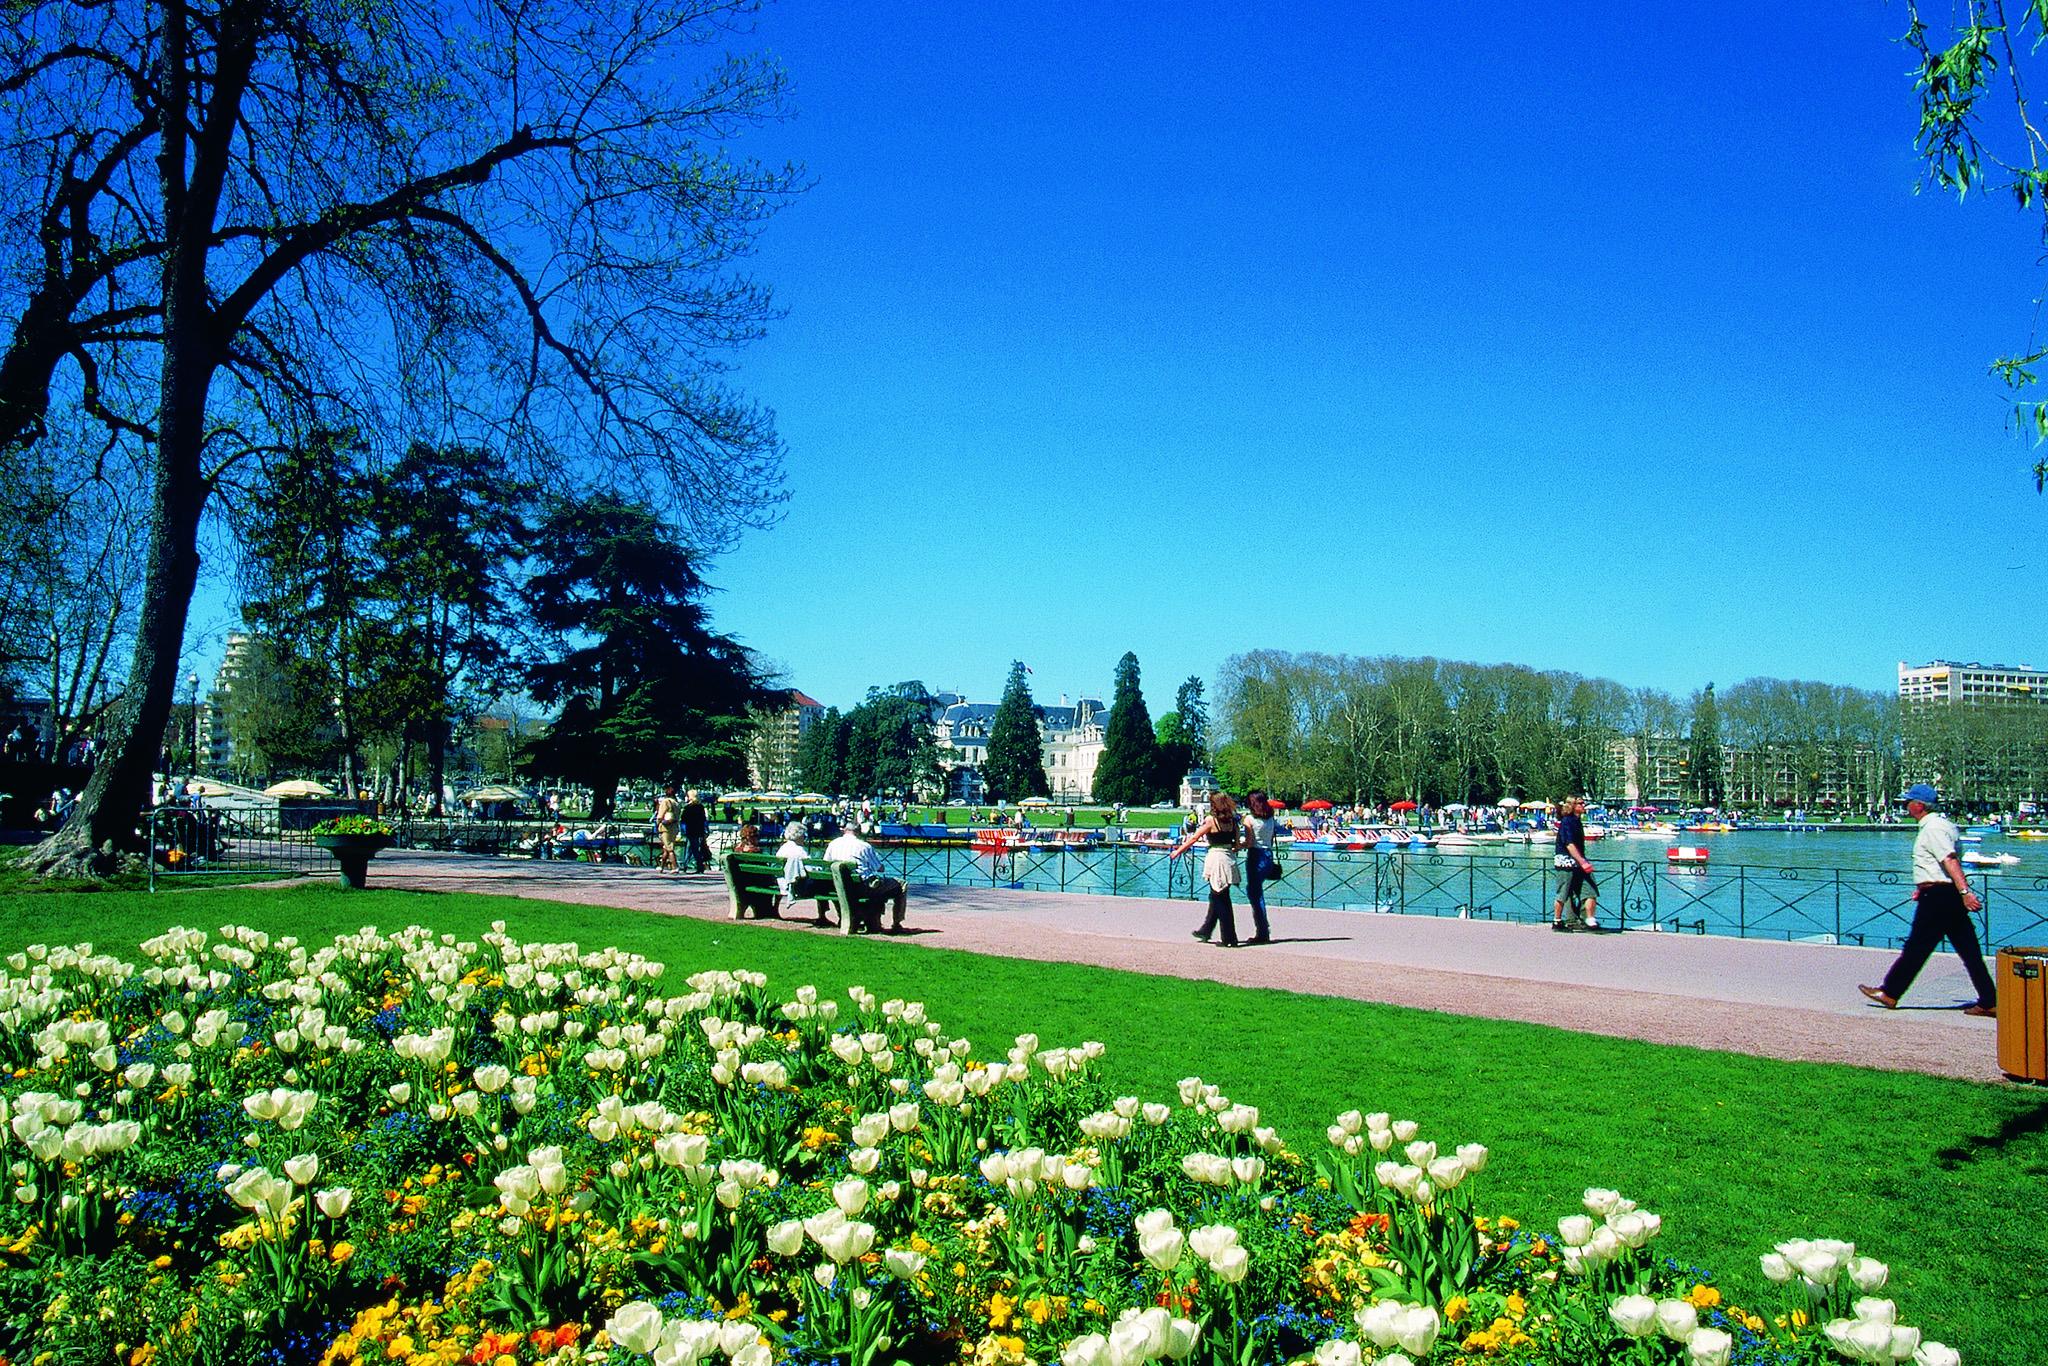 kt_2020_370_Keytours_excursions_Swisstours_annecy_jardin_de_l'europe1_2048_10